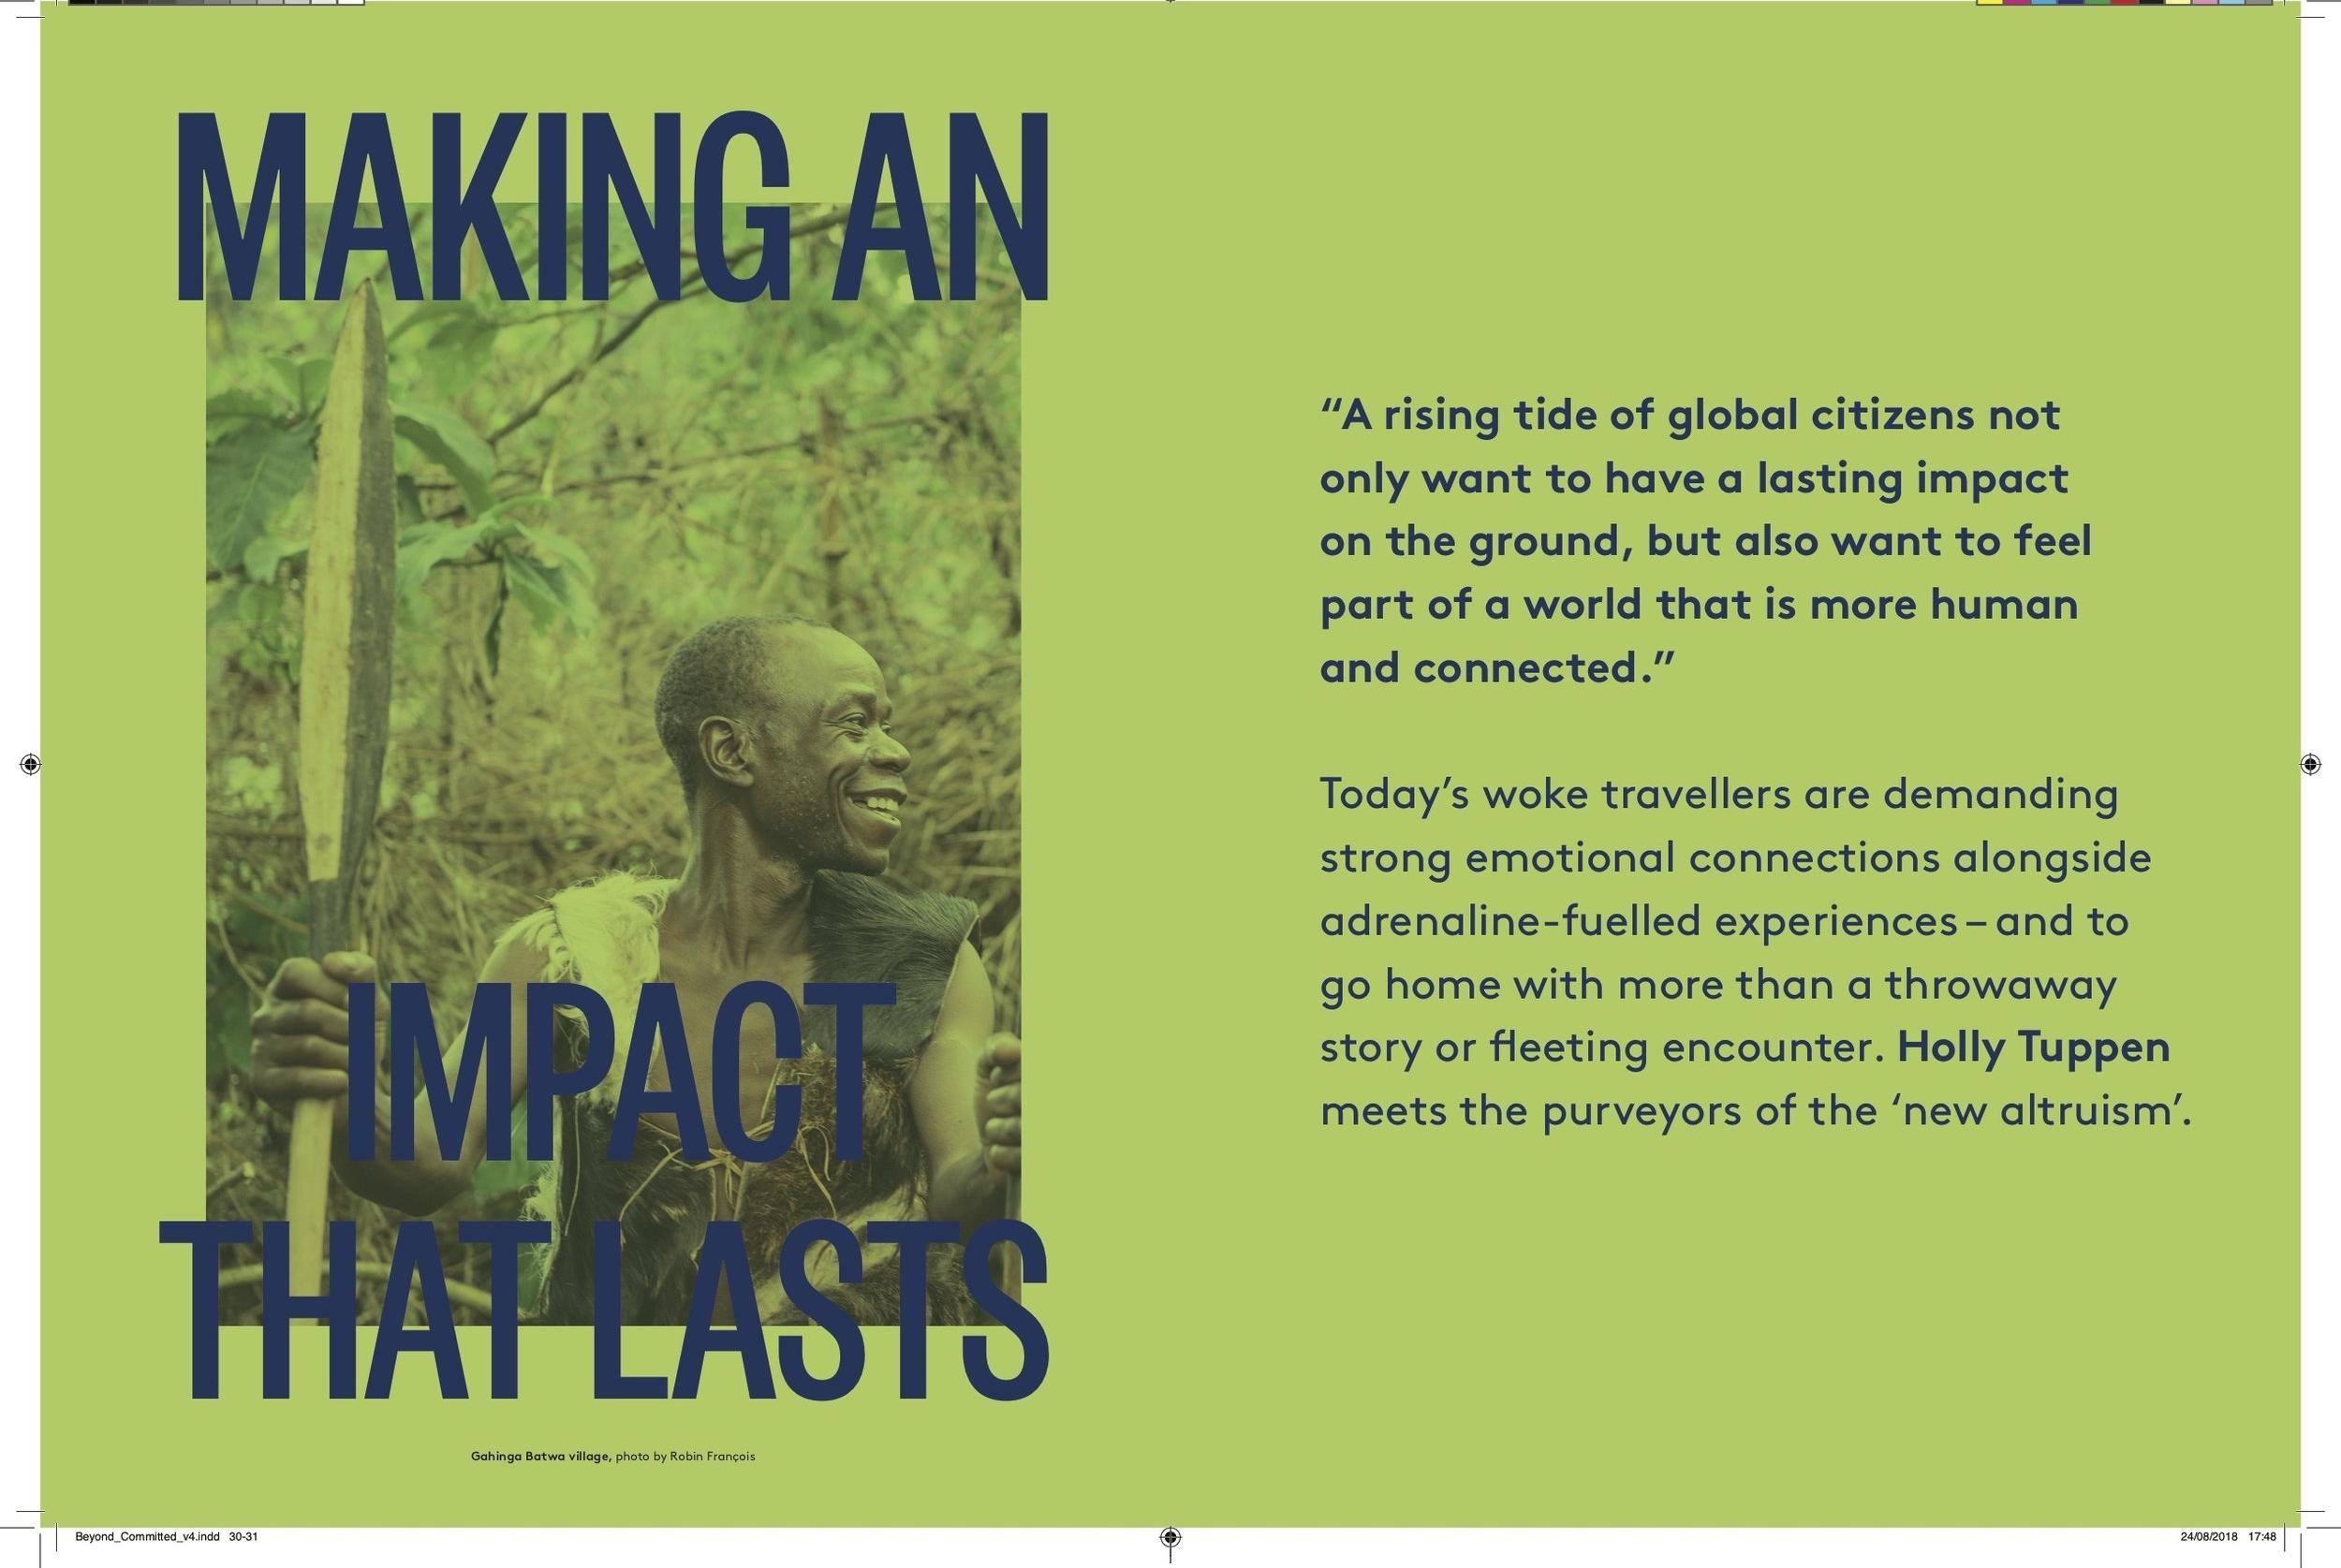 Beyond_Committed_Lasting Impact 1.jpg